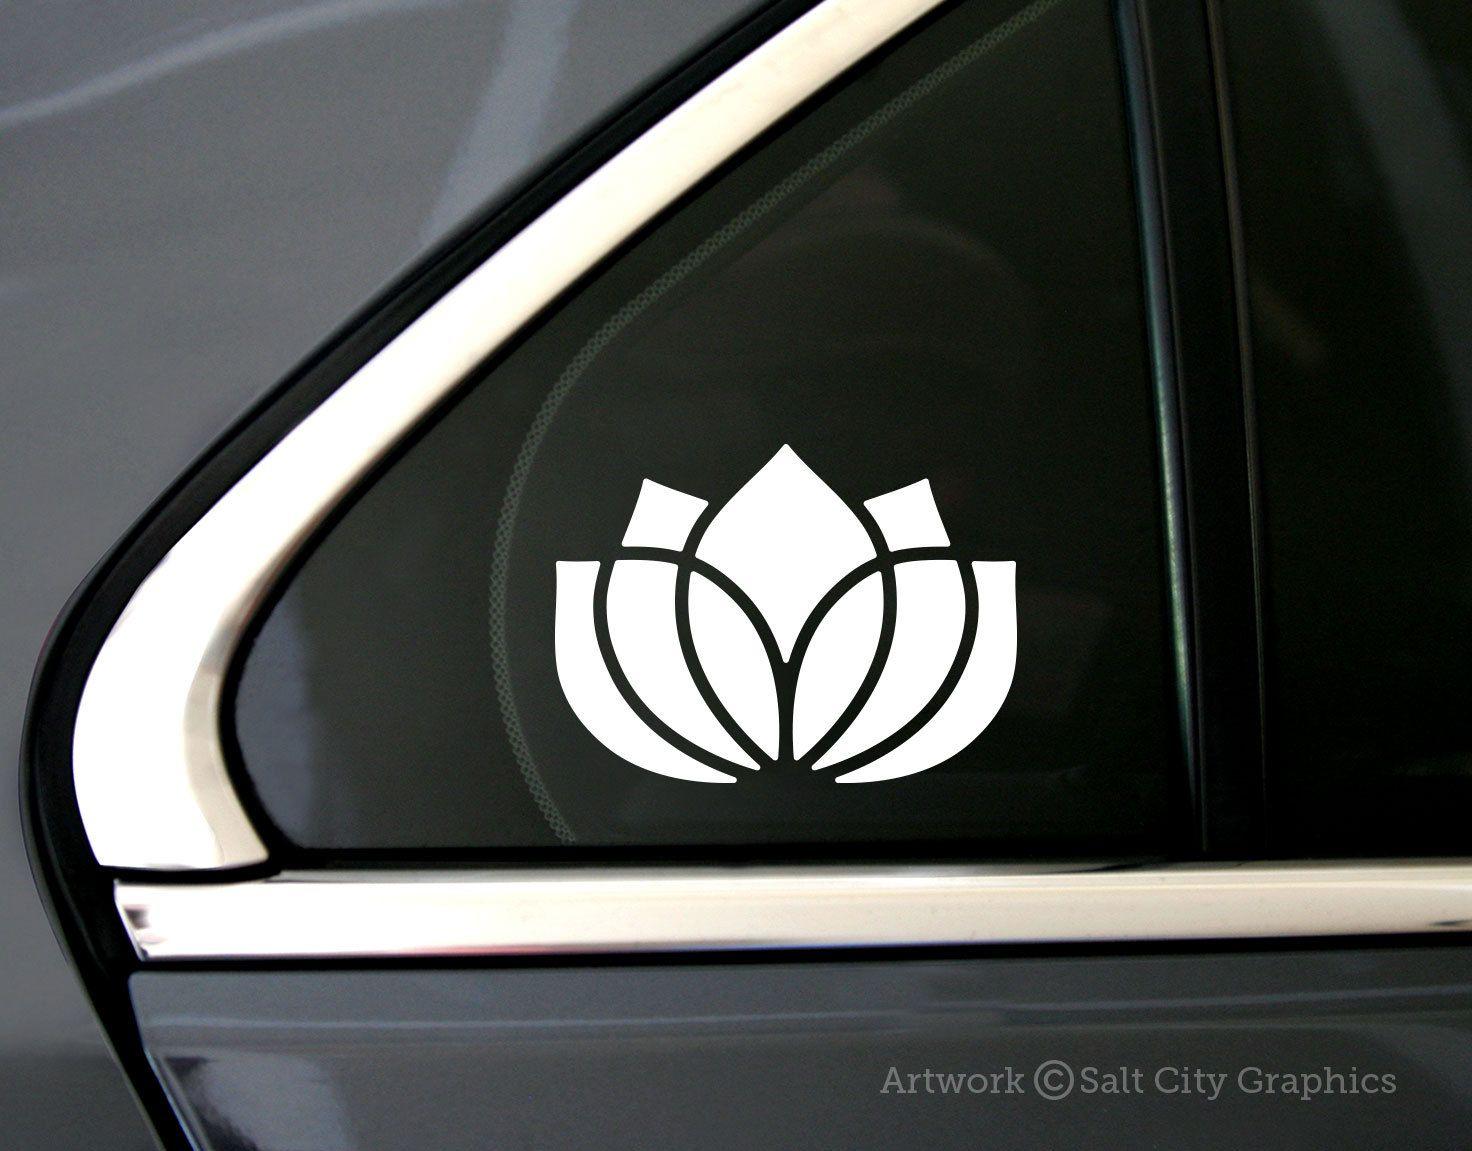 Lotus Flower Sticker Lotus Flower Decal Yoga Symbol Etsy Car Decals Vinyl Bumper Stickers Car Accessories [ 1151 x 1472 Pixel ]